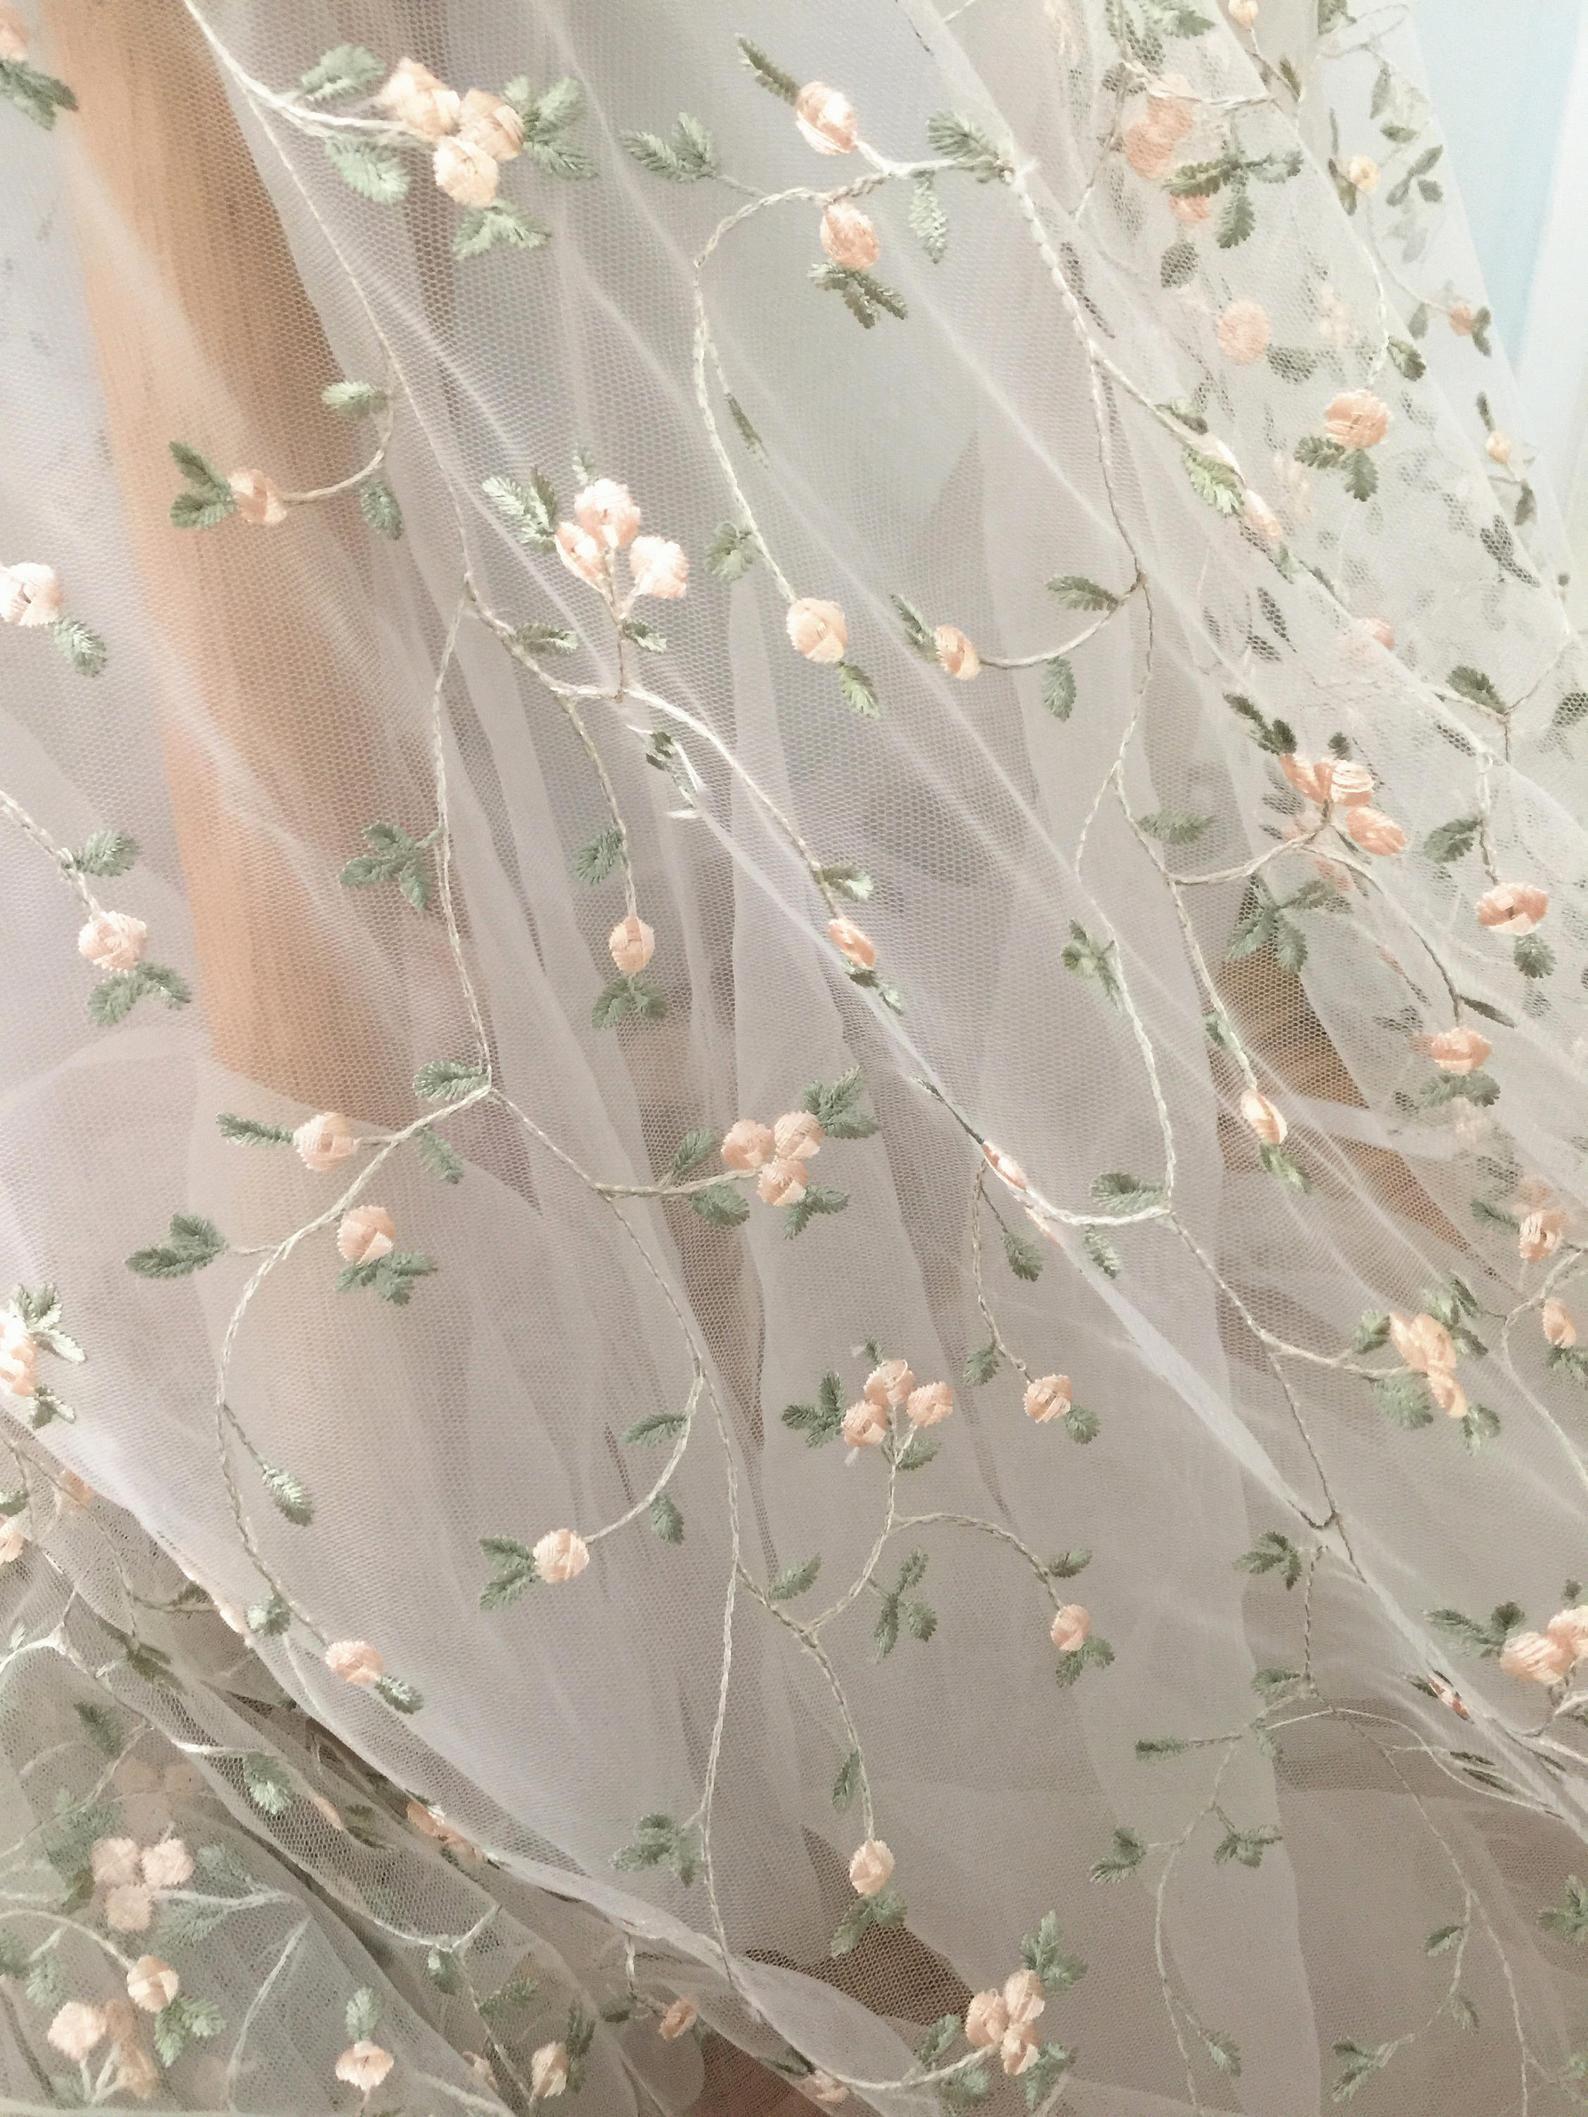 Ricamo floreale Tulle Pizzo Tessuto con Viarosa Verde Chiaro Motivo Foglia Verde , Avorio Tulle Sposa Abito Bambino Tessuto